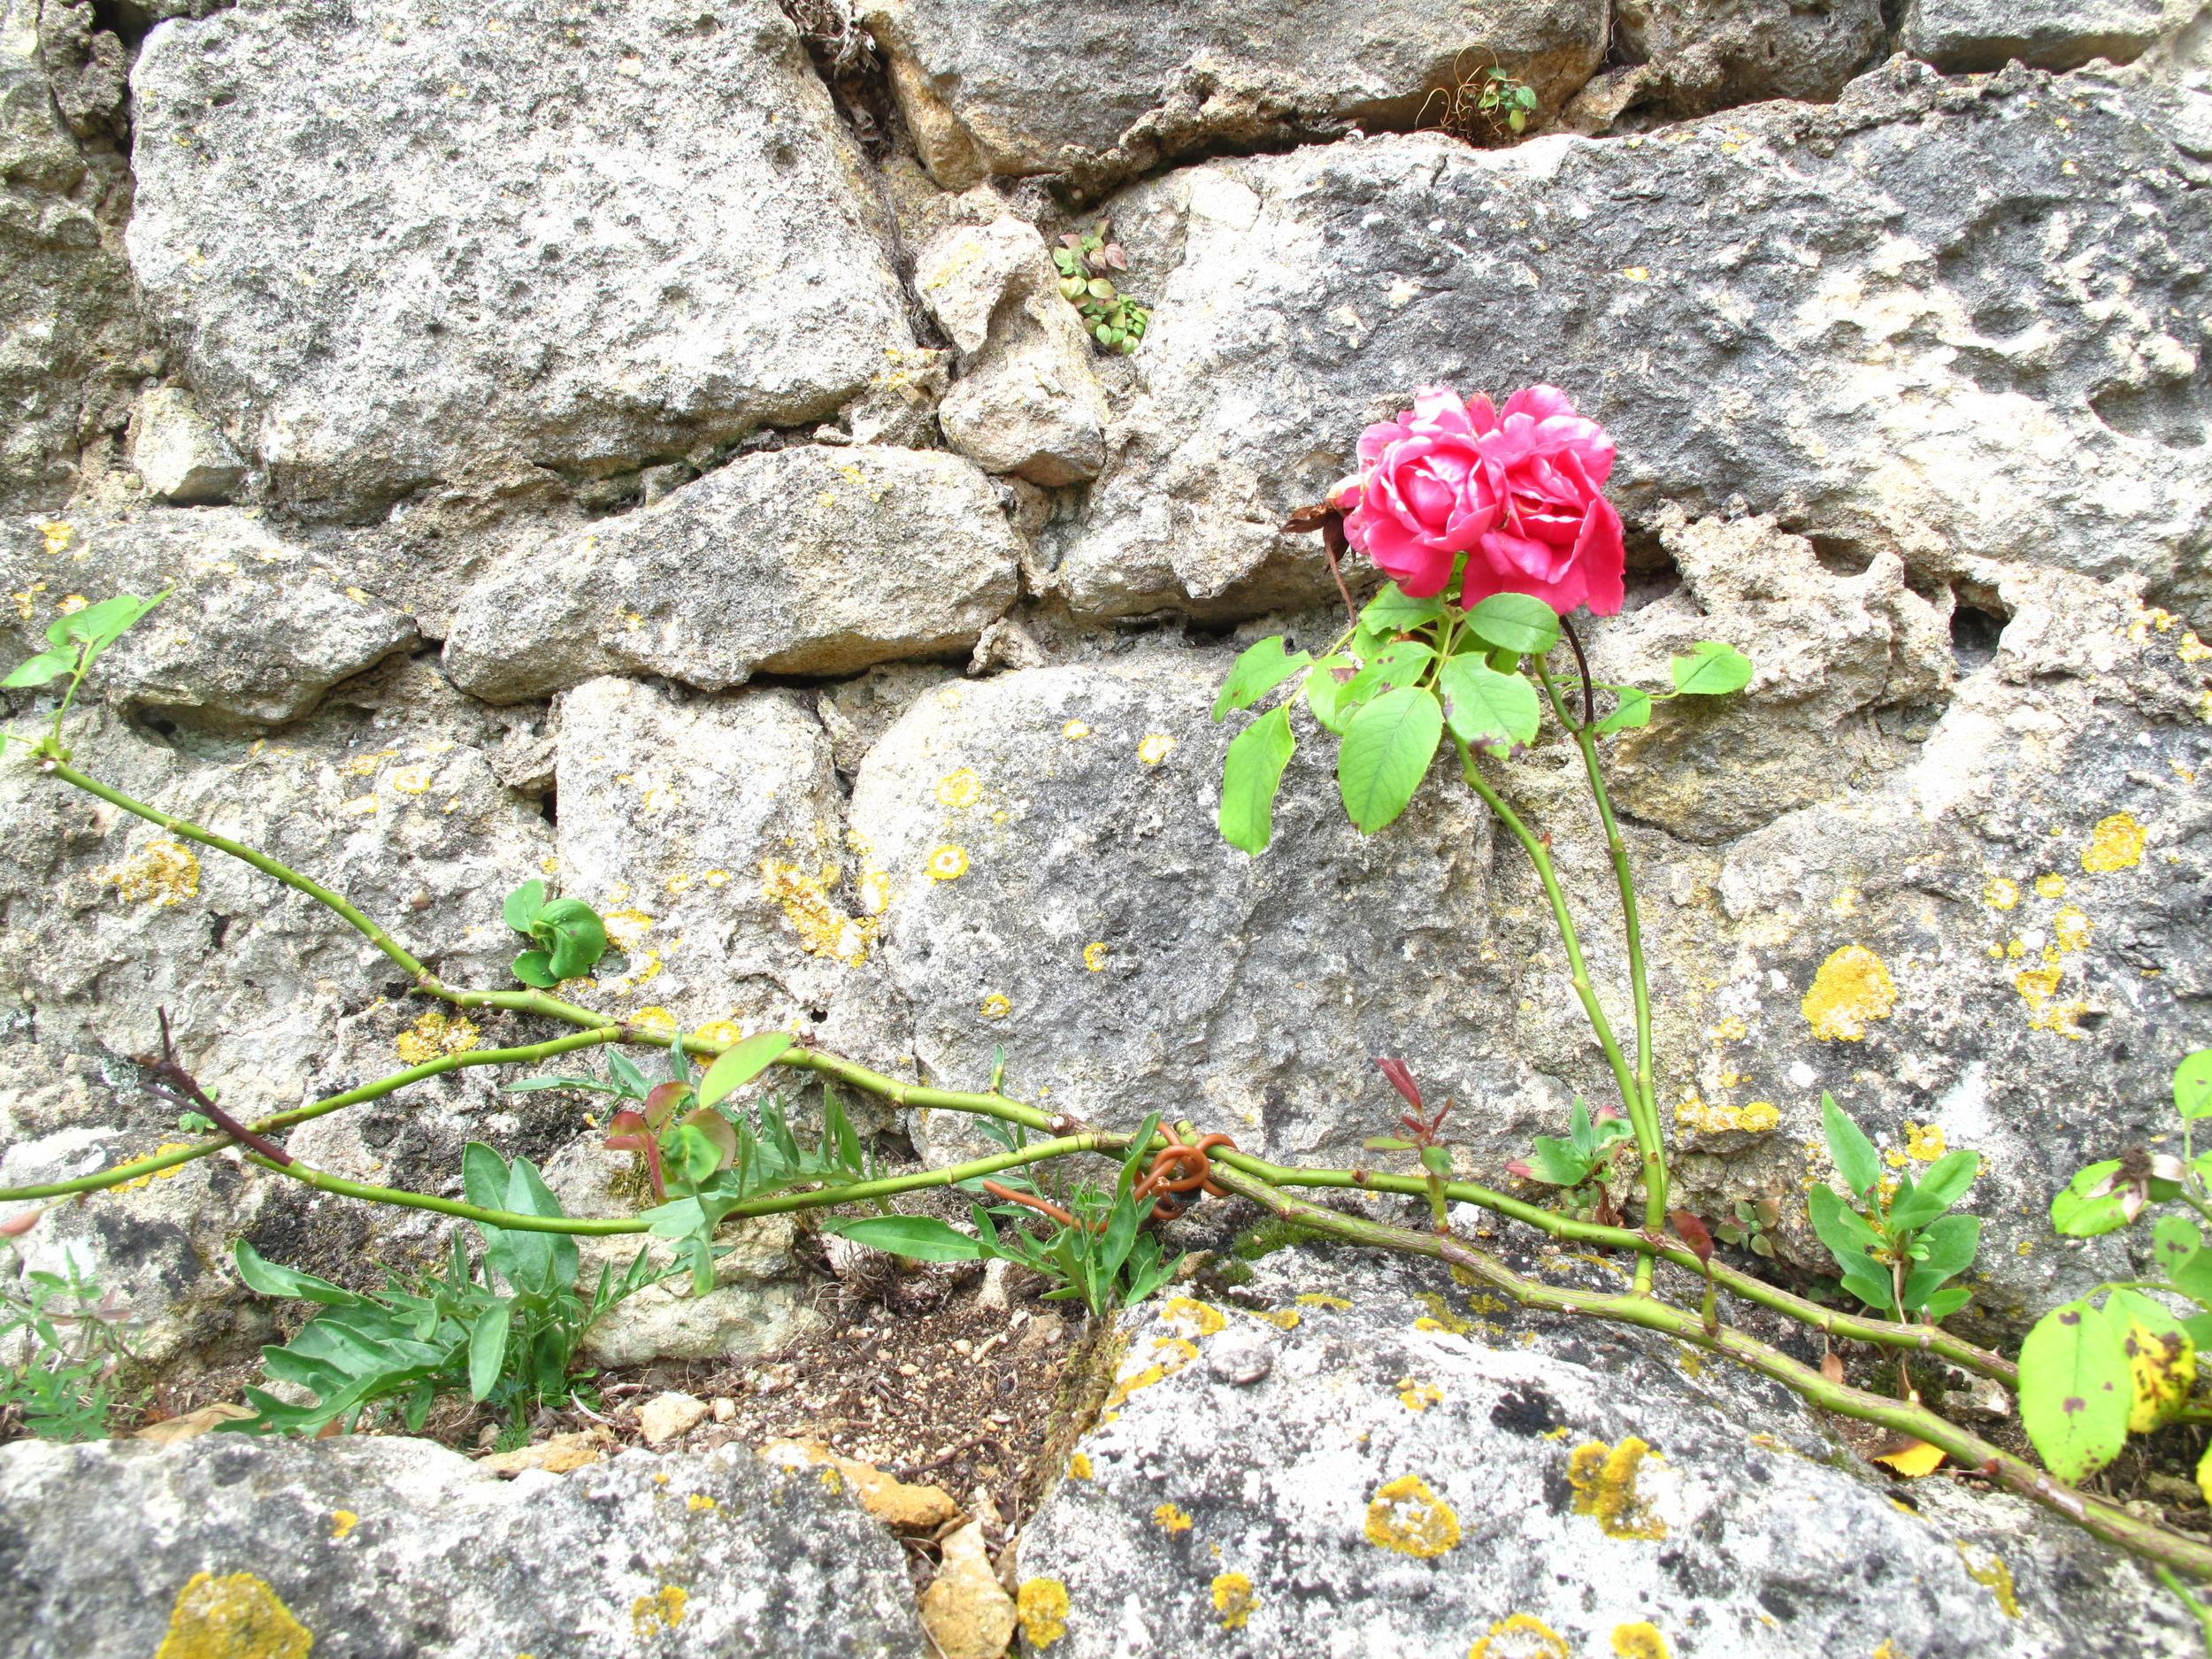 Rose bush on a stone wall, Dordogne, France.